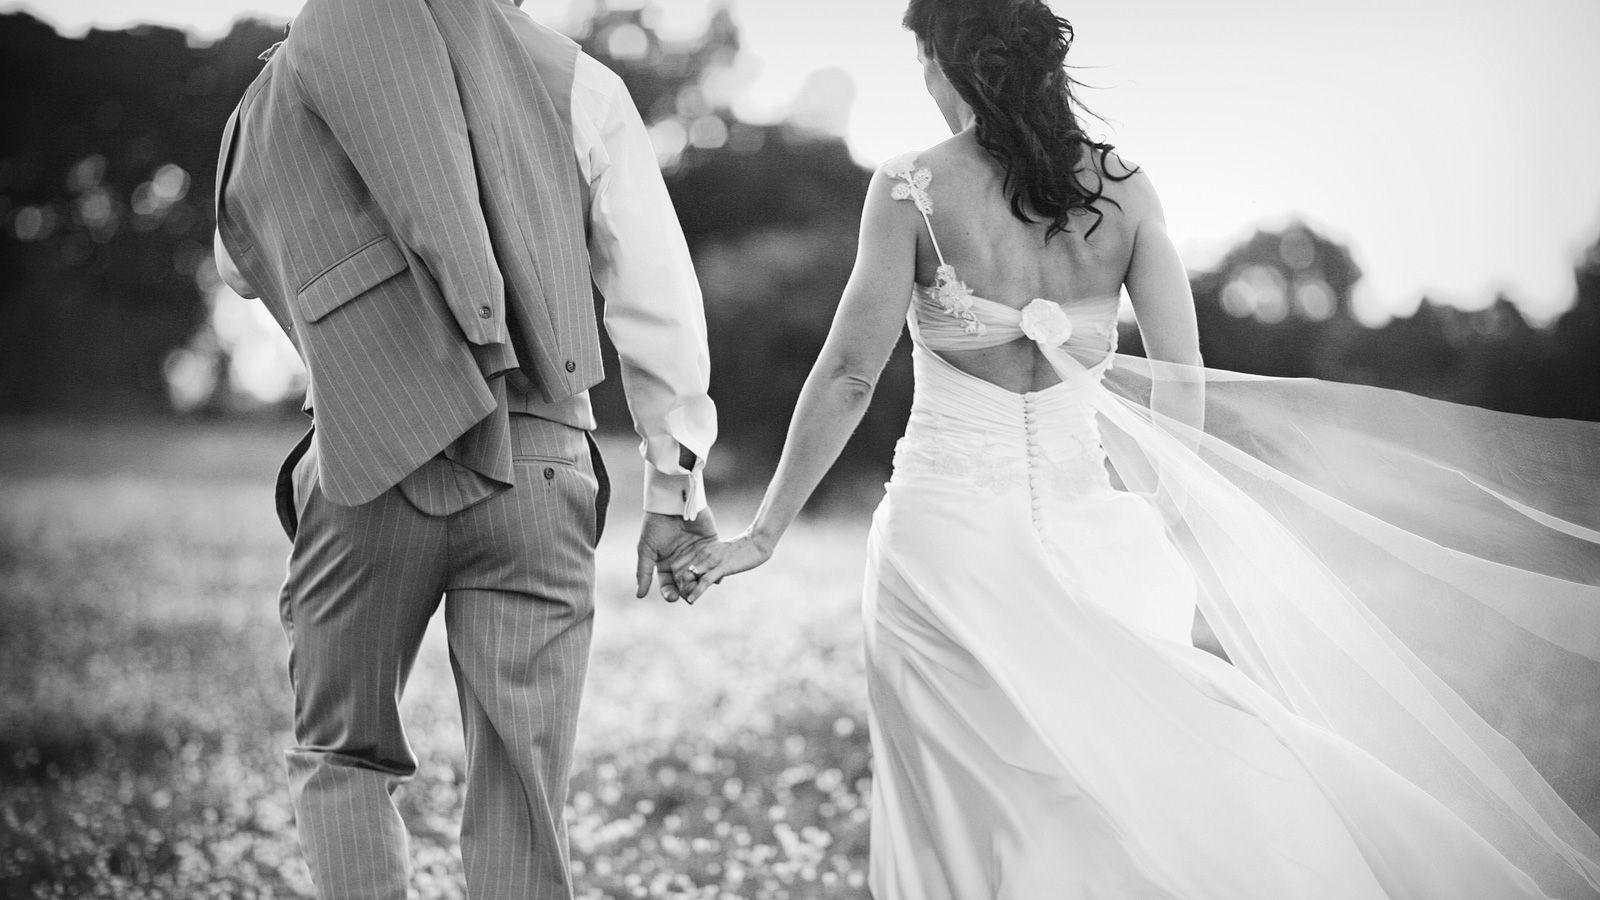 Wedding Photoraphy Fine Art Wedding Photography Wedding Photographer Melbourne Fun Wedding Photography